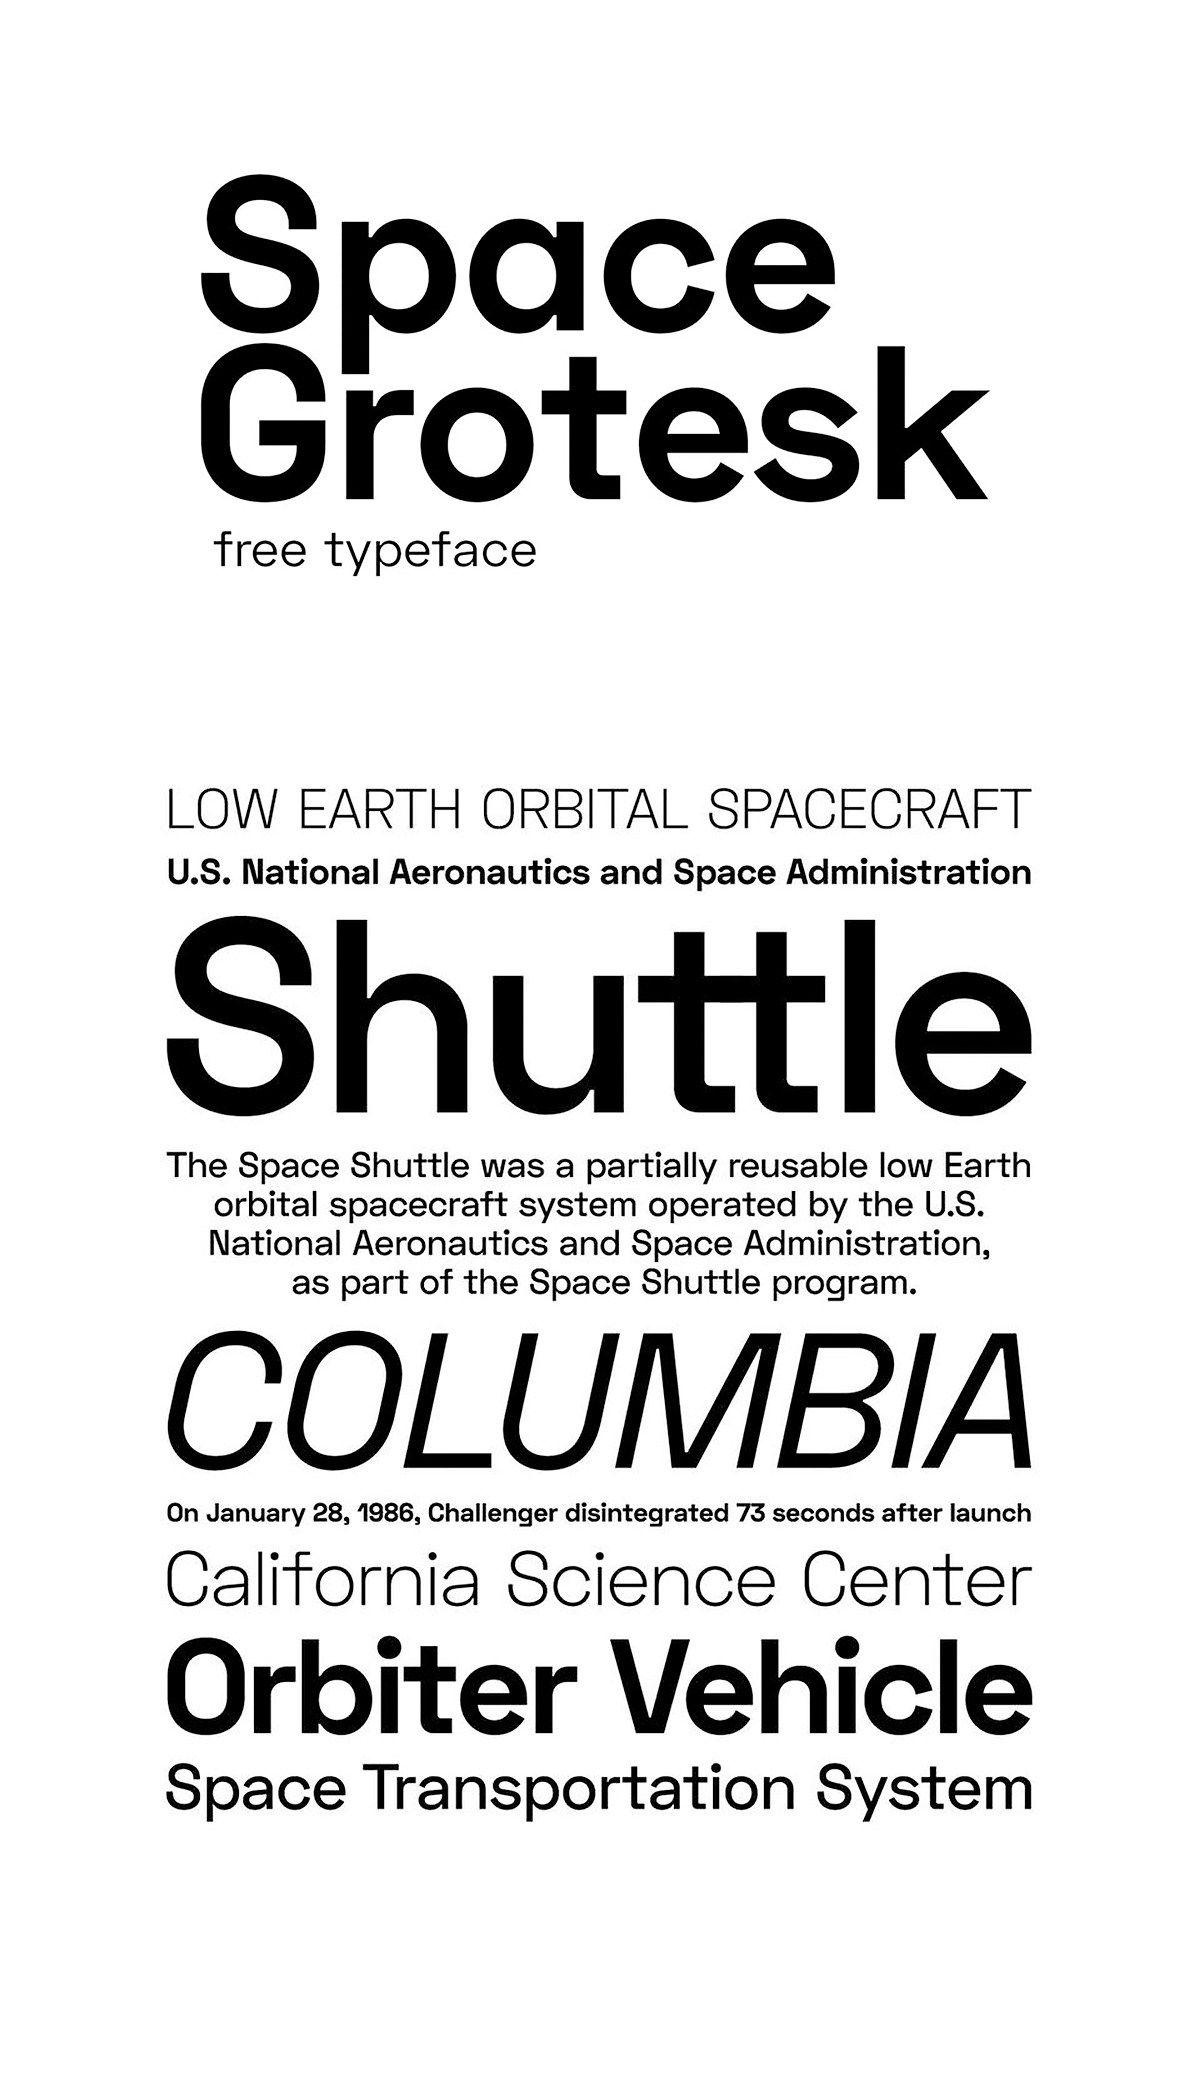 Space Grotesk Free Sans Serif Font Sans Serif Fonts Free Fonts Sans Serif Serif Fonts